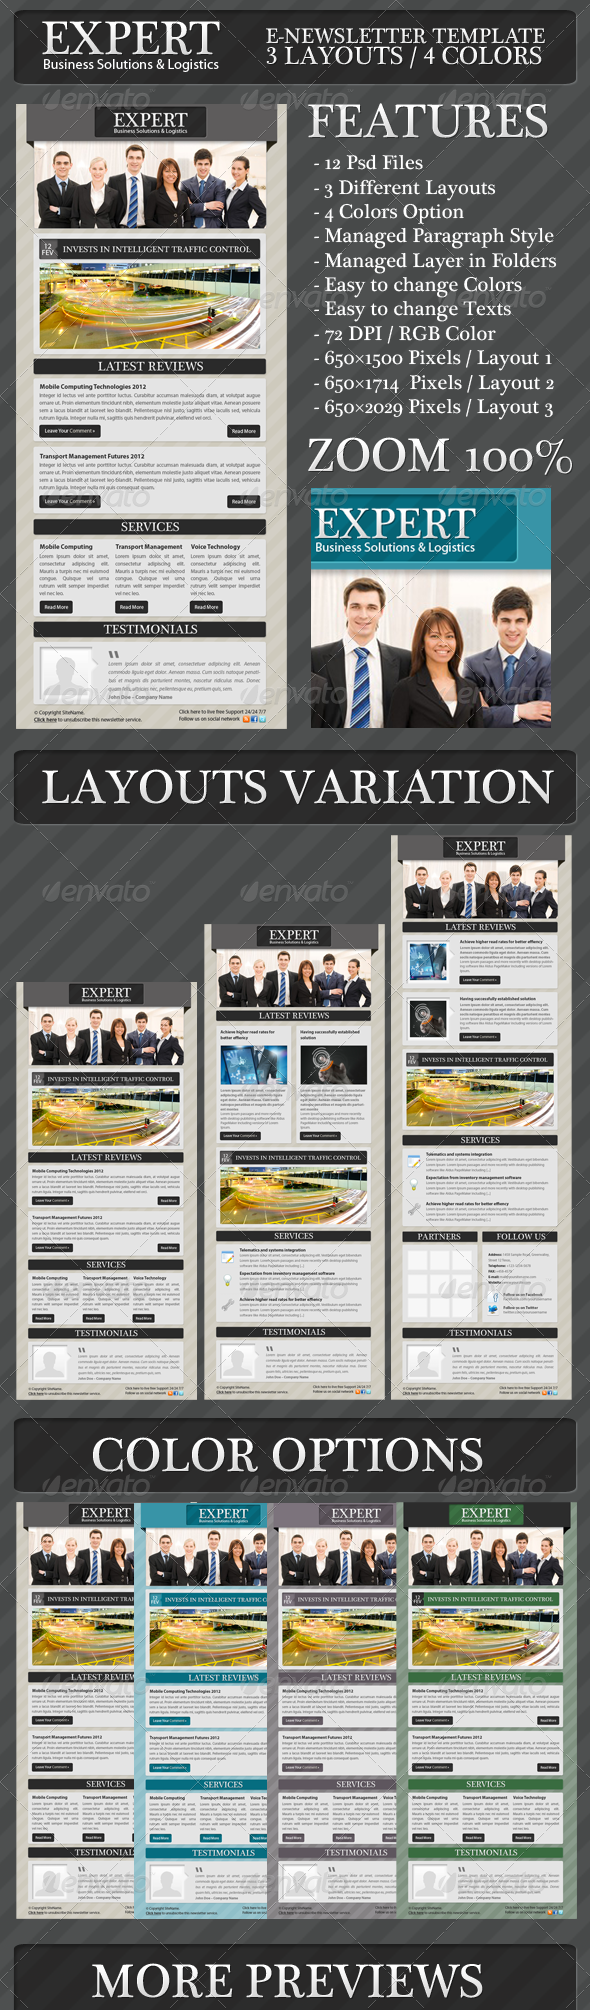 Expert Business Solution E-newsletter Template   Pinterest ...